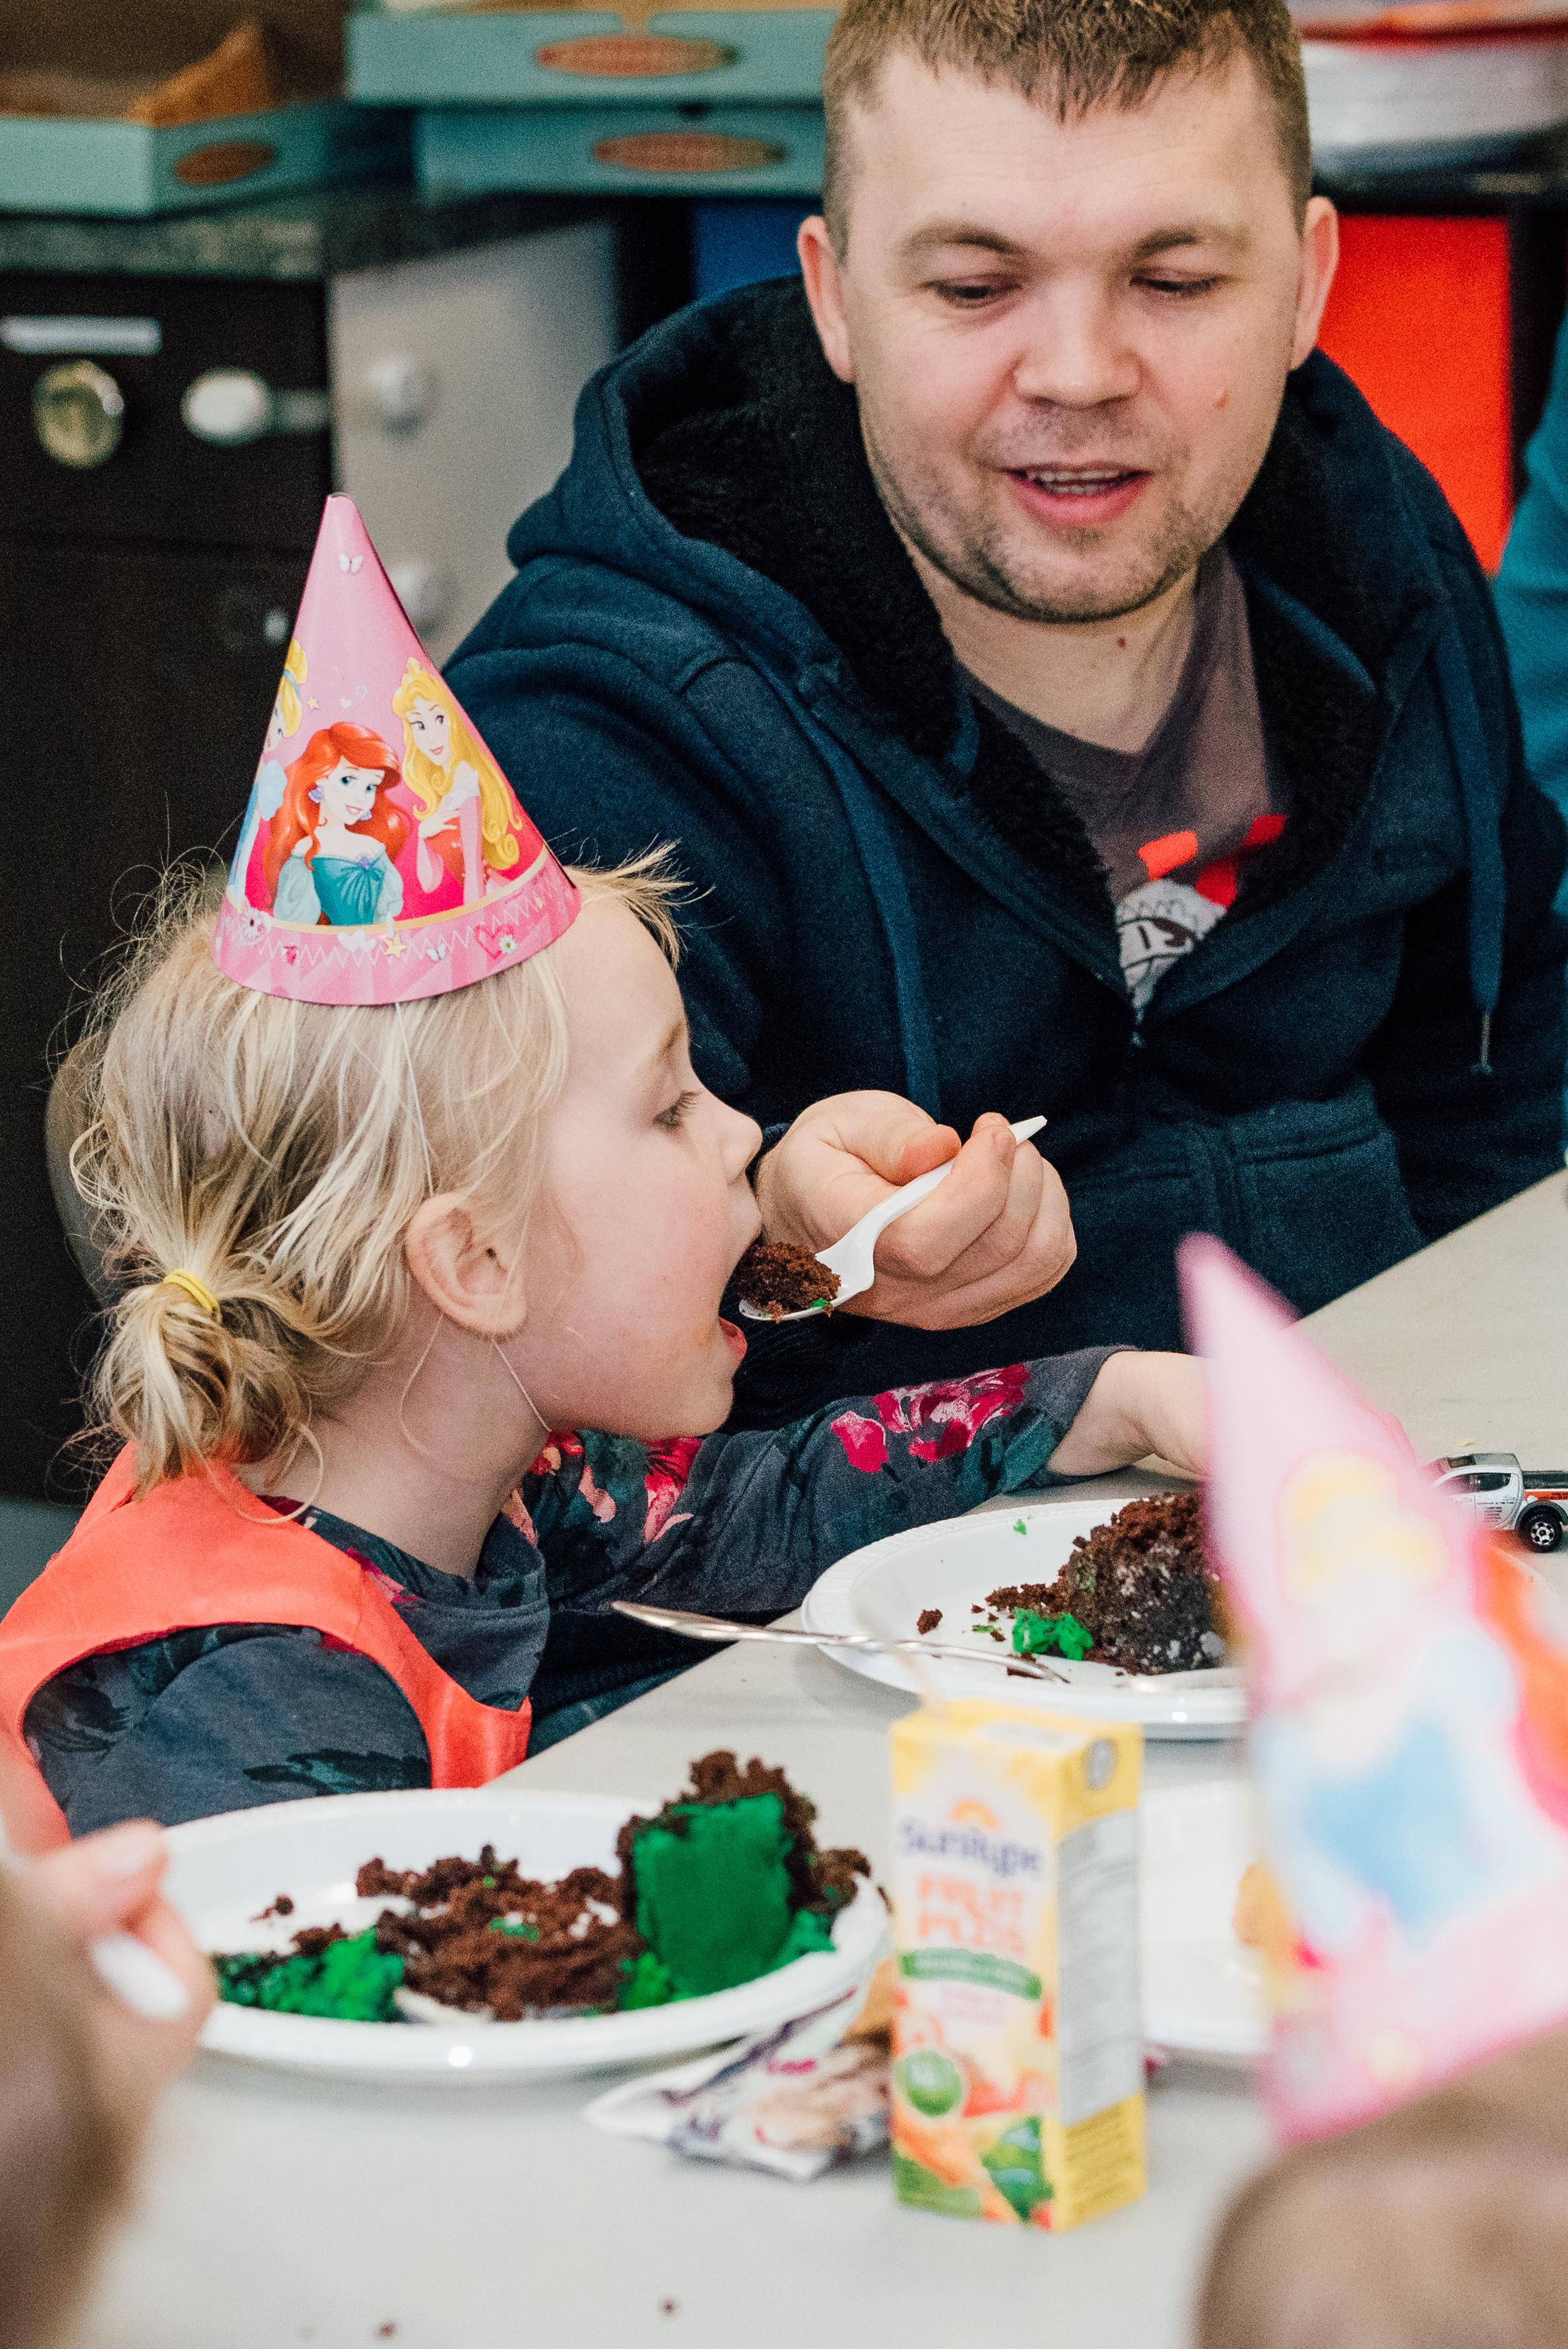 Nicola_Reiersen_Photography_Kids_Birthday_Pool_Party (47).jpg